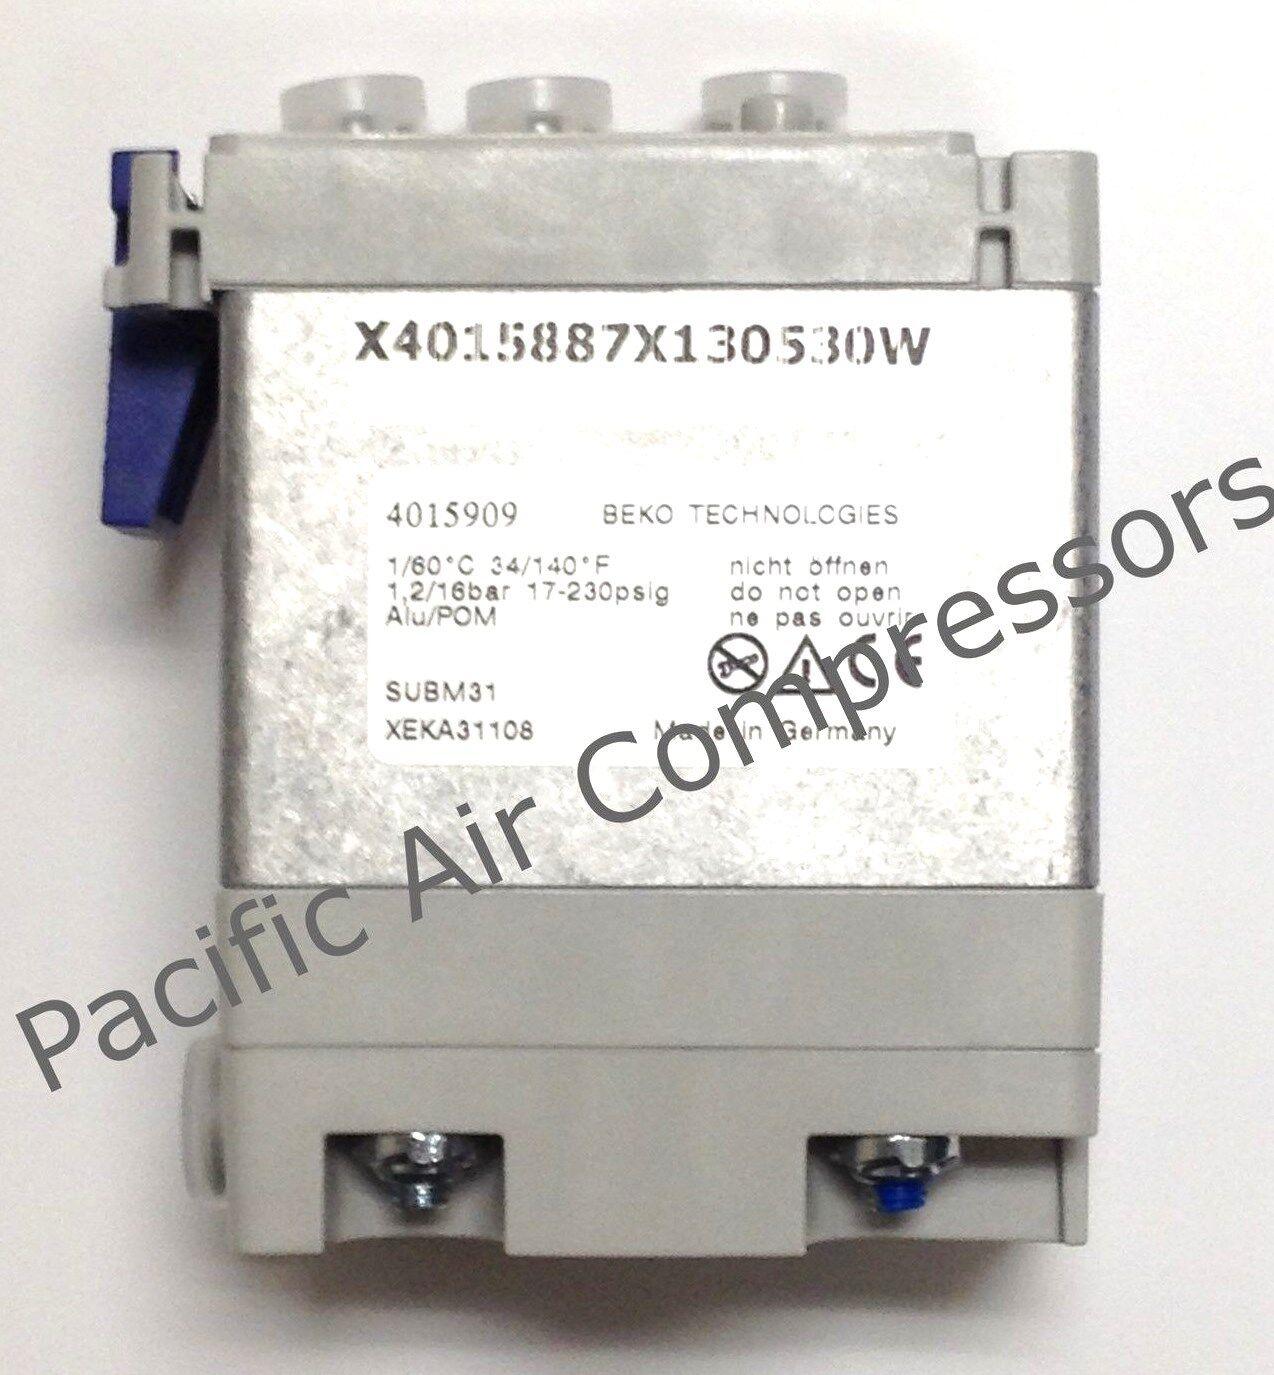 CONDENSATE Separator Qty 1 AFE XVKT02AF1 BEKO Direct Replacement KIT